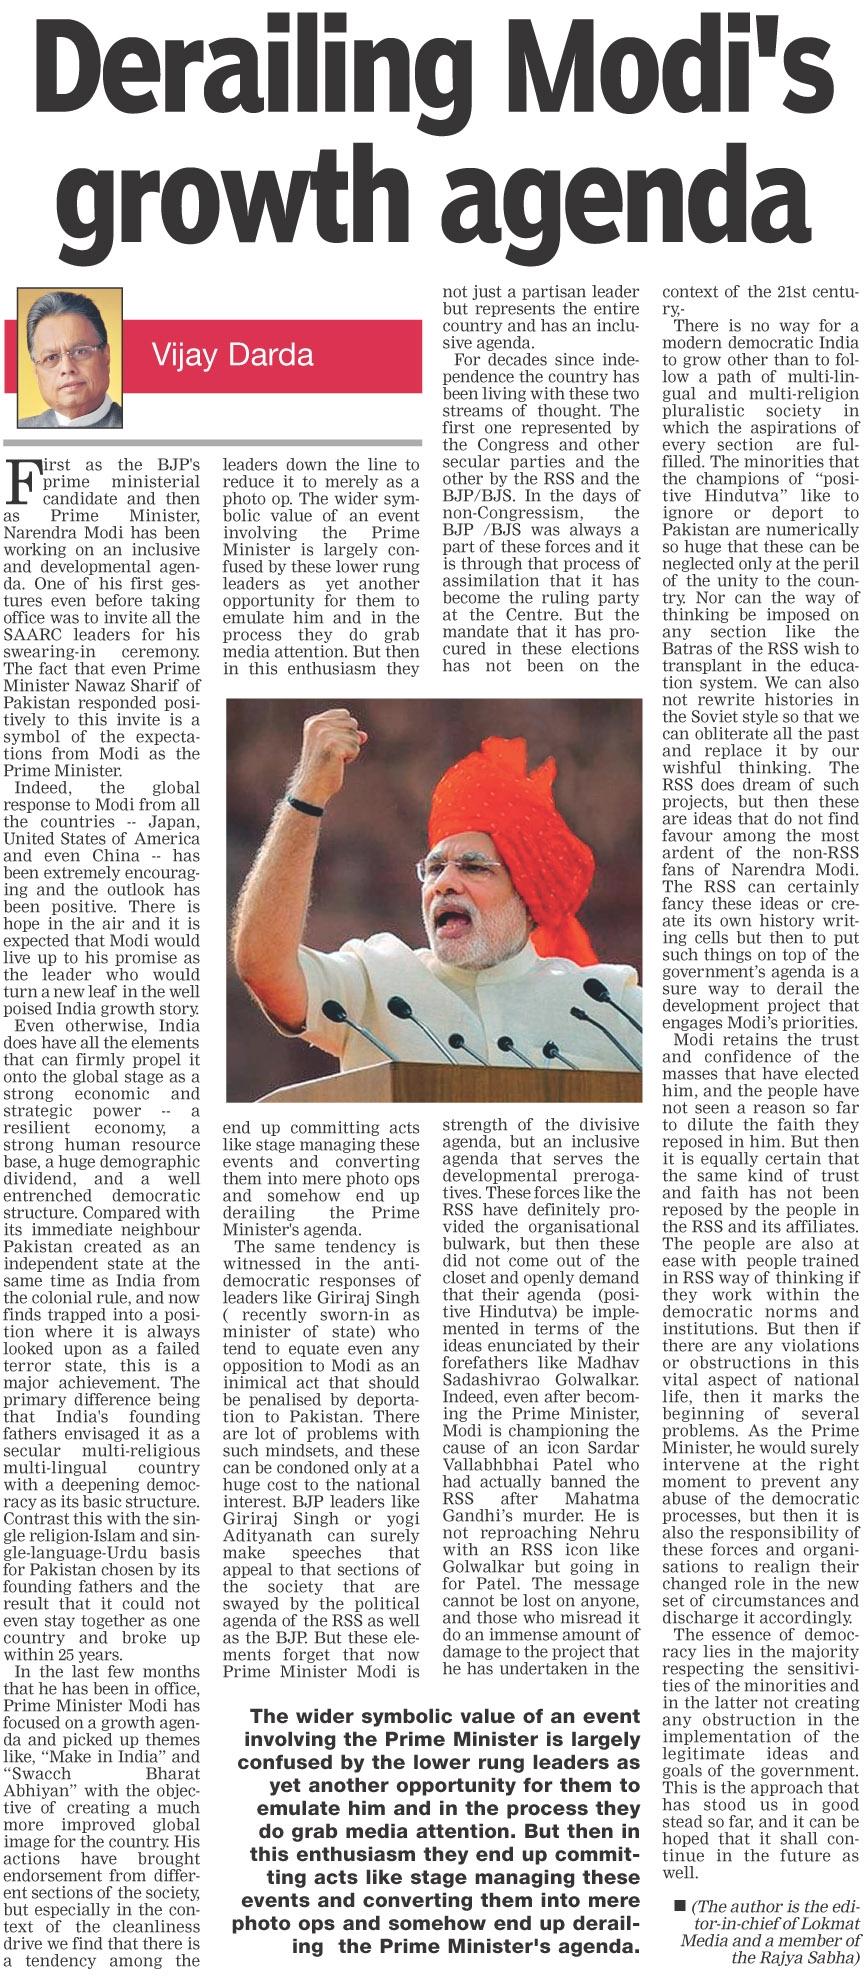 Derailing Modi's growth agenda